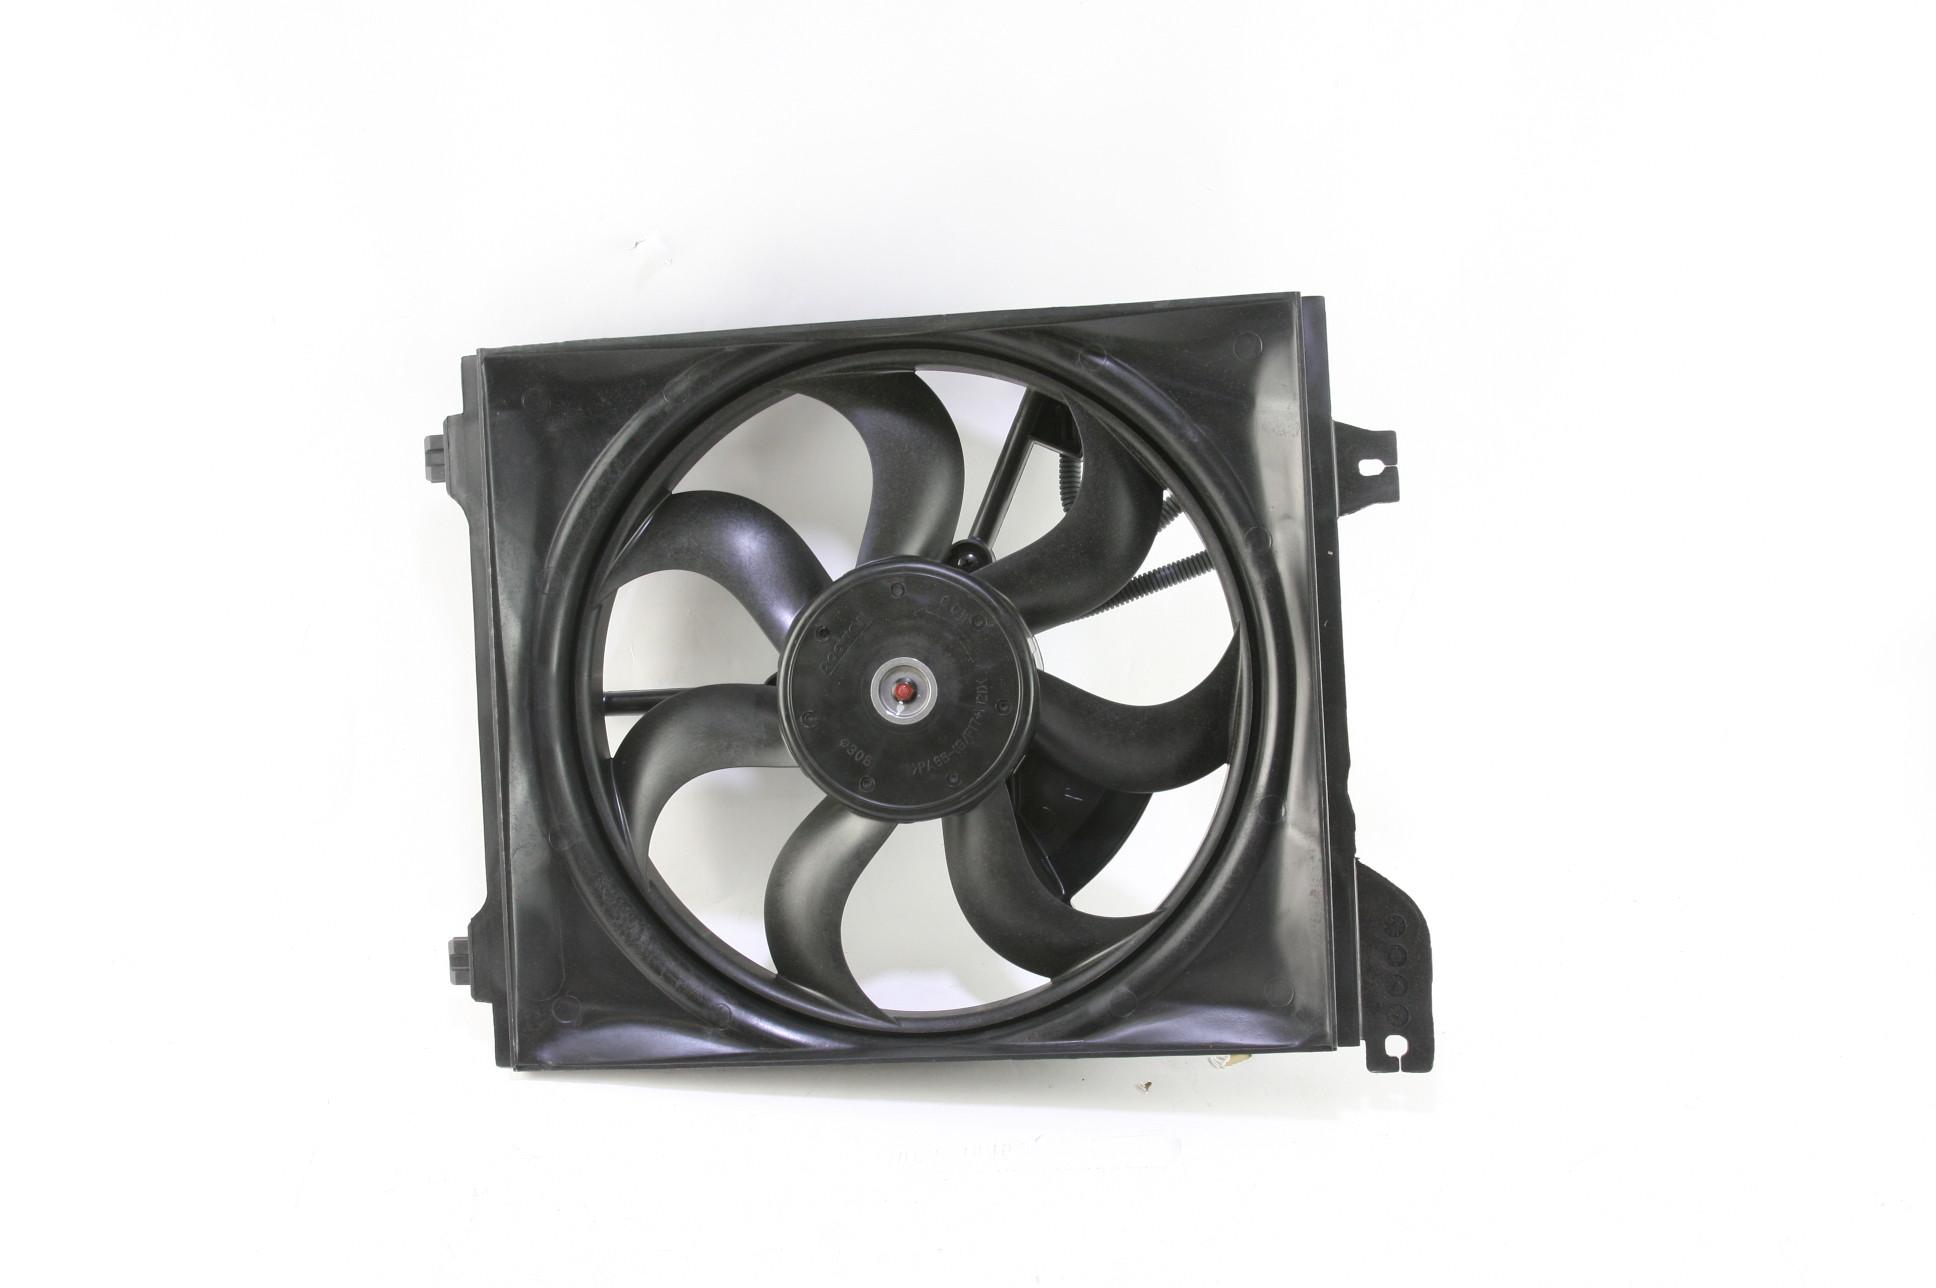 ~ New Kia OEM 977301G000 Kia Rio Radiator Condenser Fan Motor Free Shipping - image 1